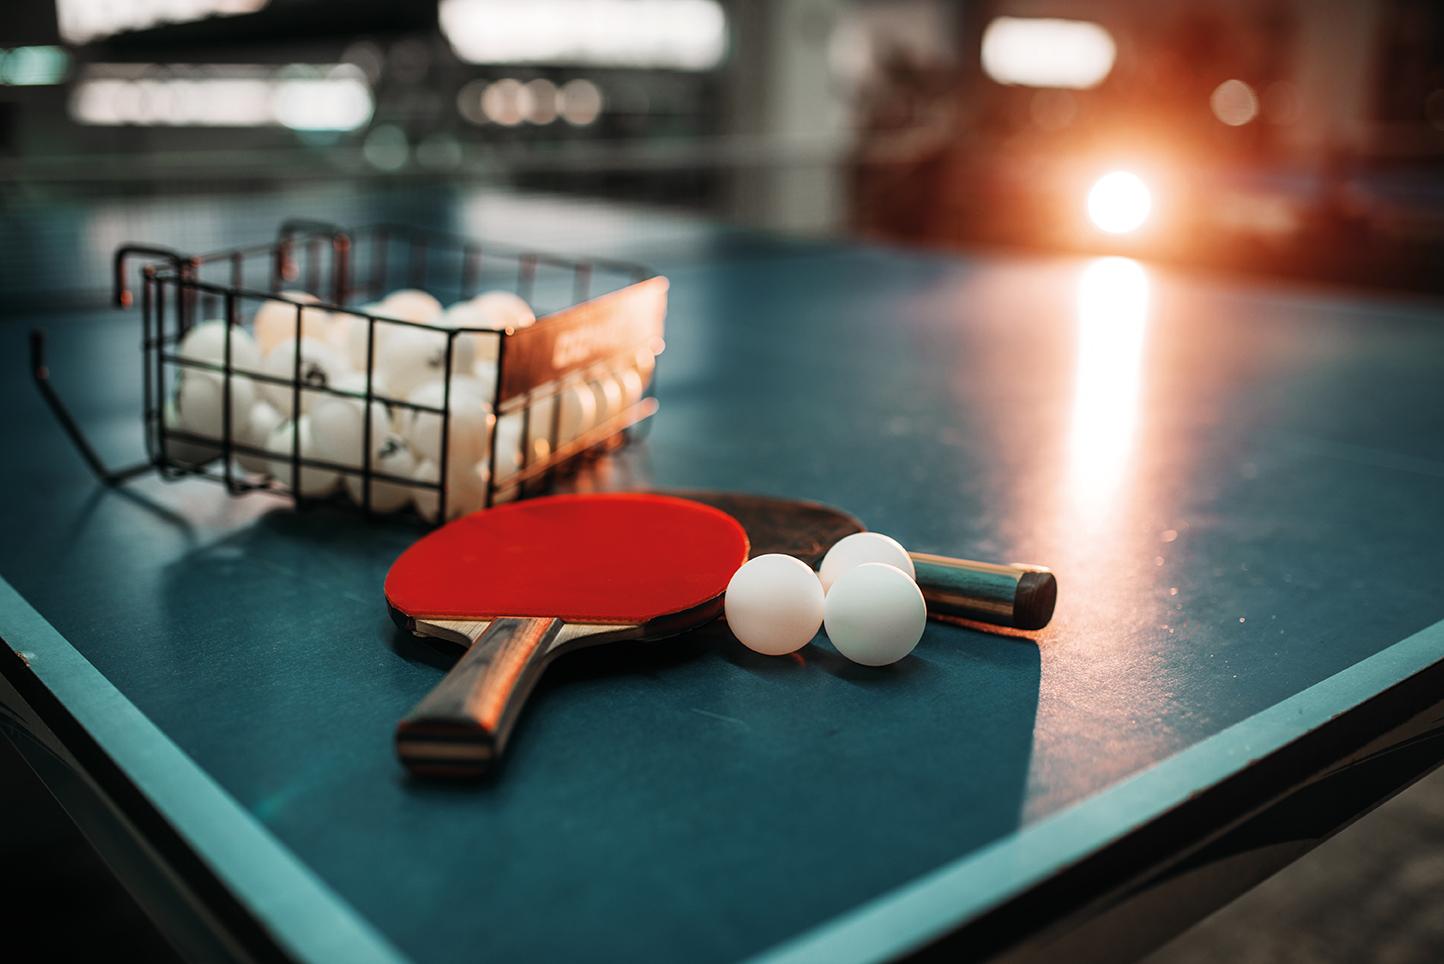 bigstock-Ping-pong-table-rackets-and-b-192379435.jpg